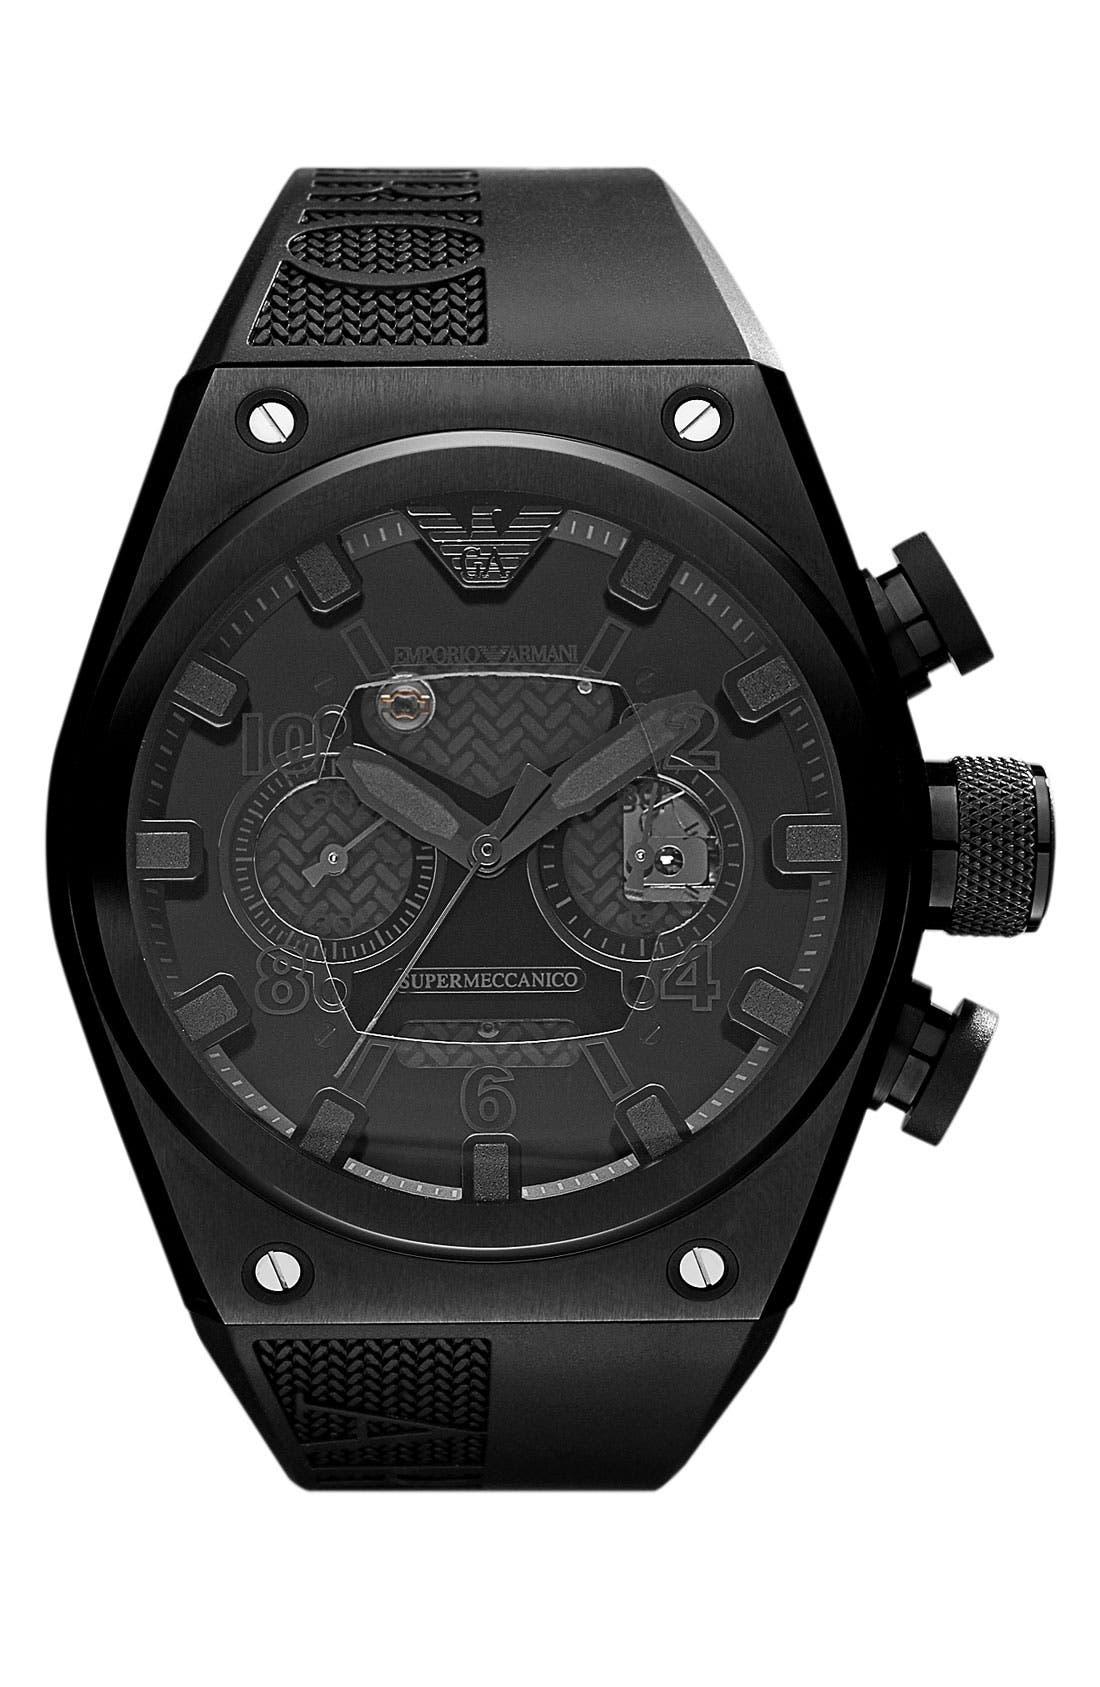 Alternate Image 1 Selected - Emporio Armani 'Super Meccanico - 30th Anniversary' Watch (Limited Edition)